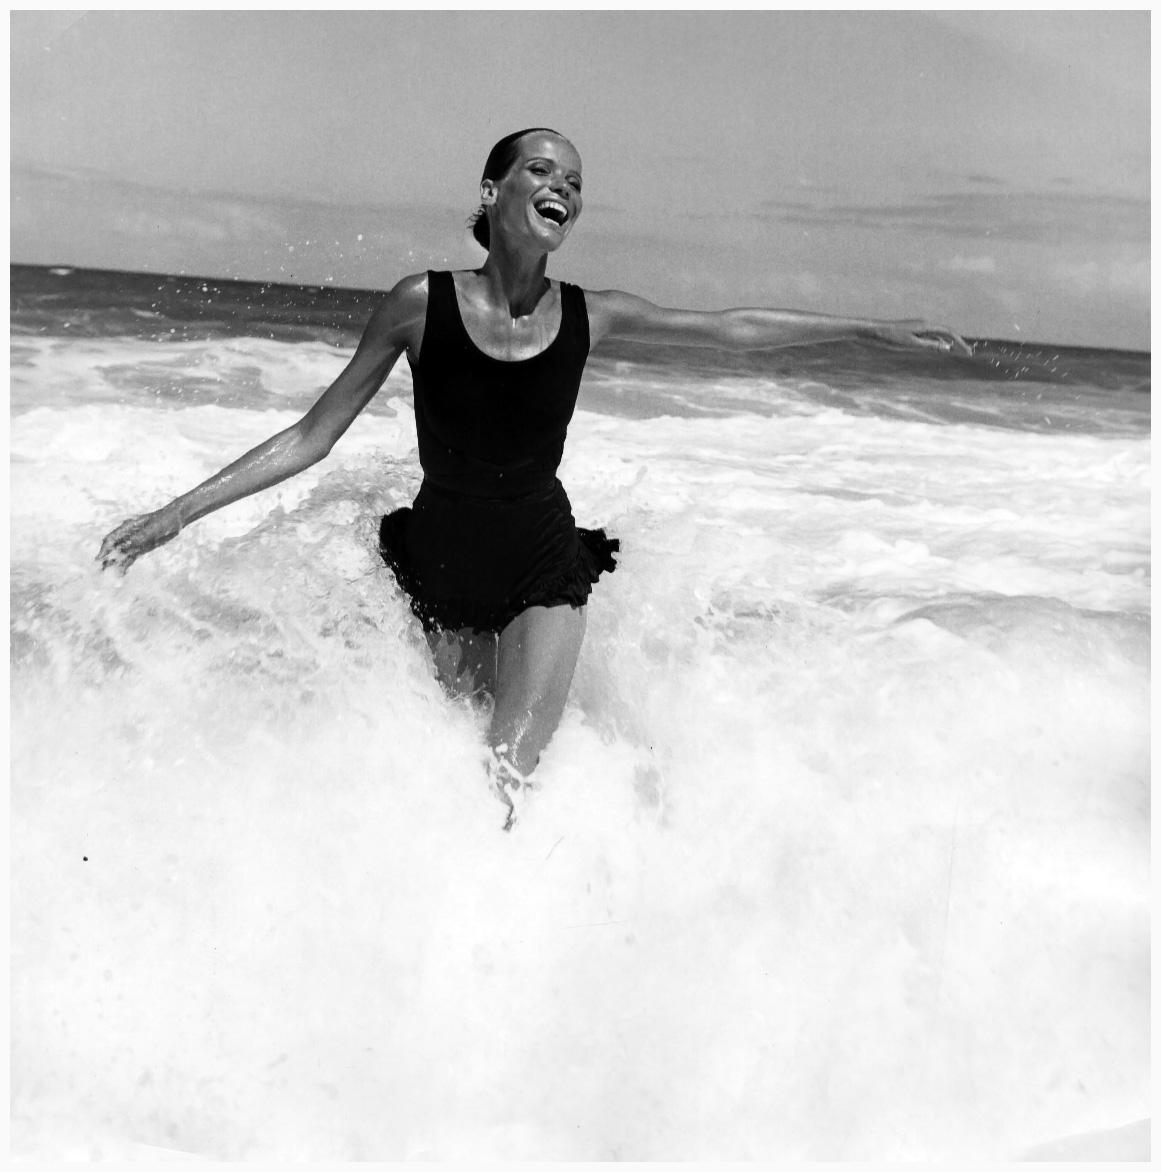 veruschka-splashing-in-the-ocean-american-vogue-brazil-1968-franco-rubartelli-a2